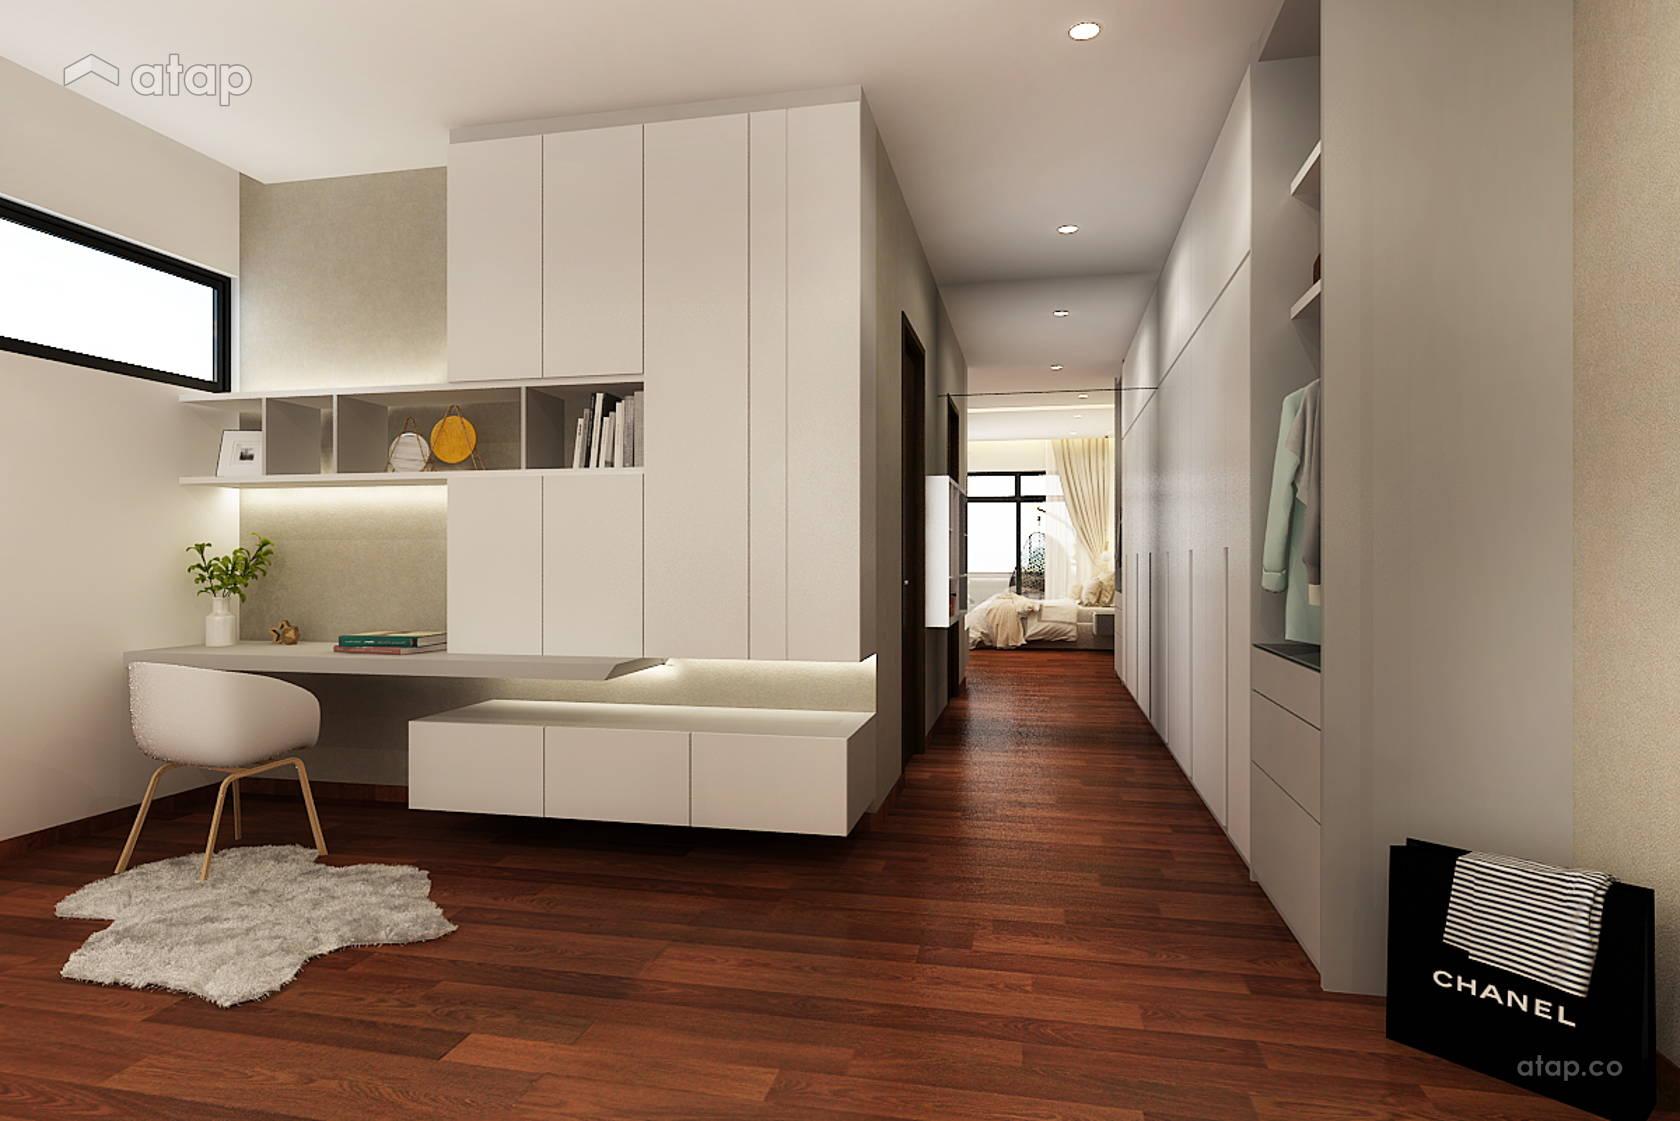 Modern study room bungalow design ideas photos malaysia - Modern study room ideas ...